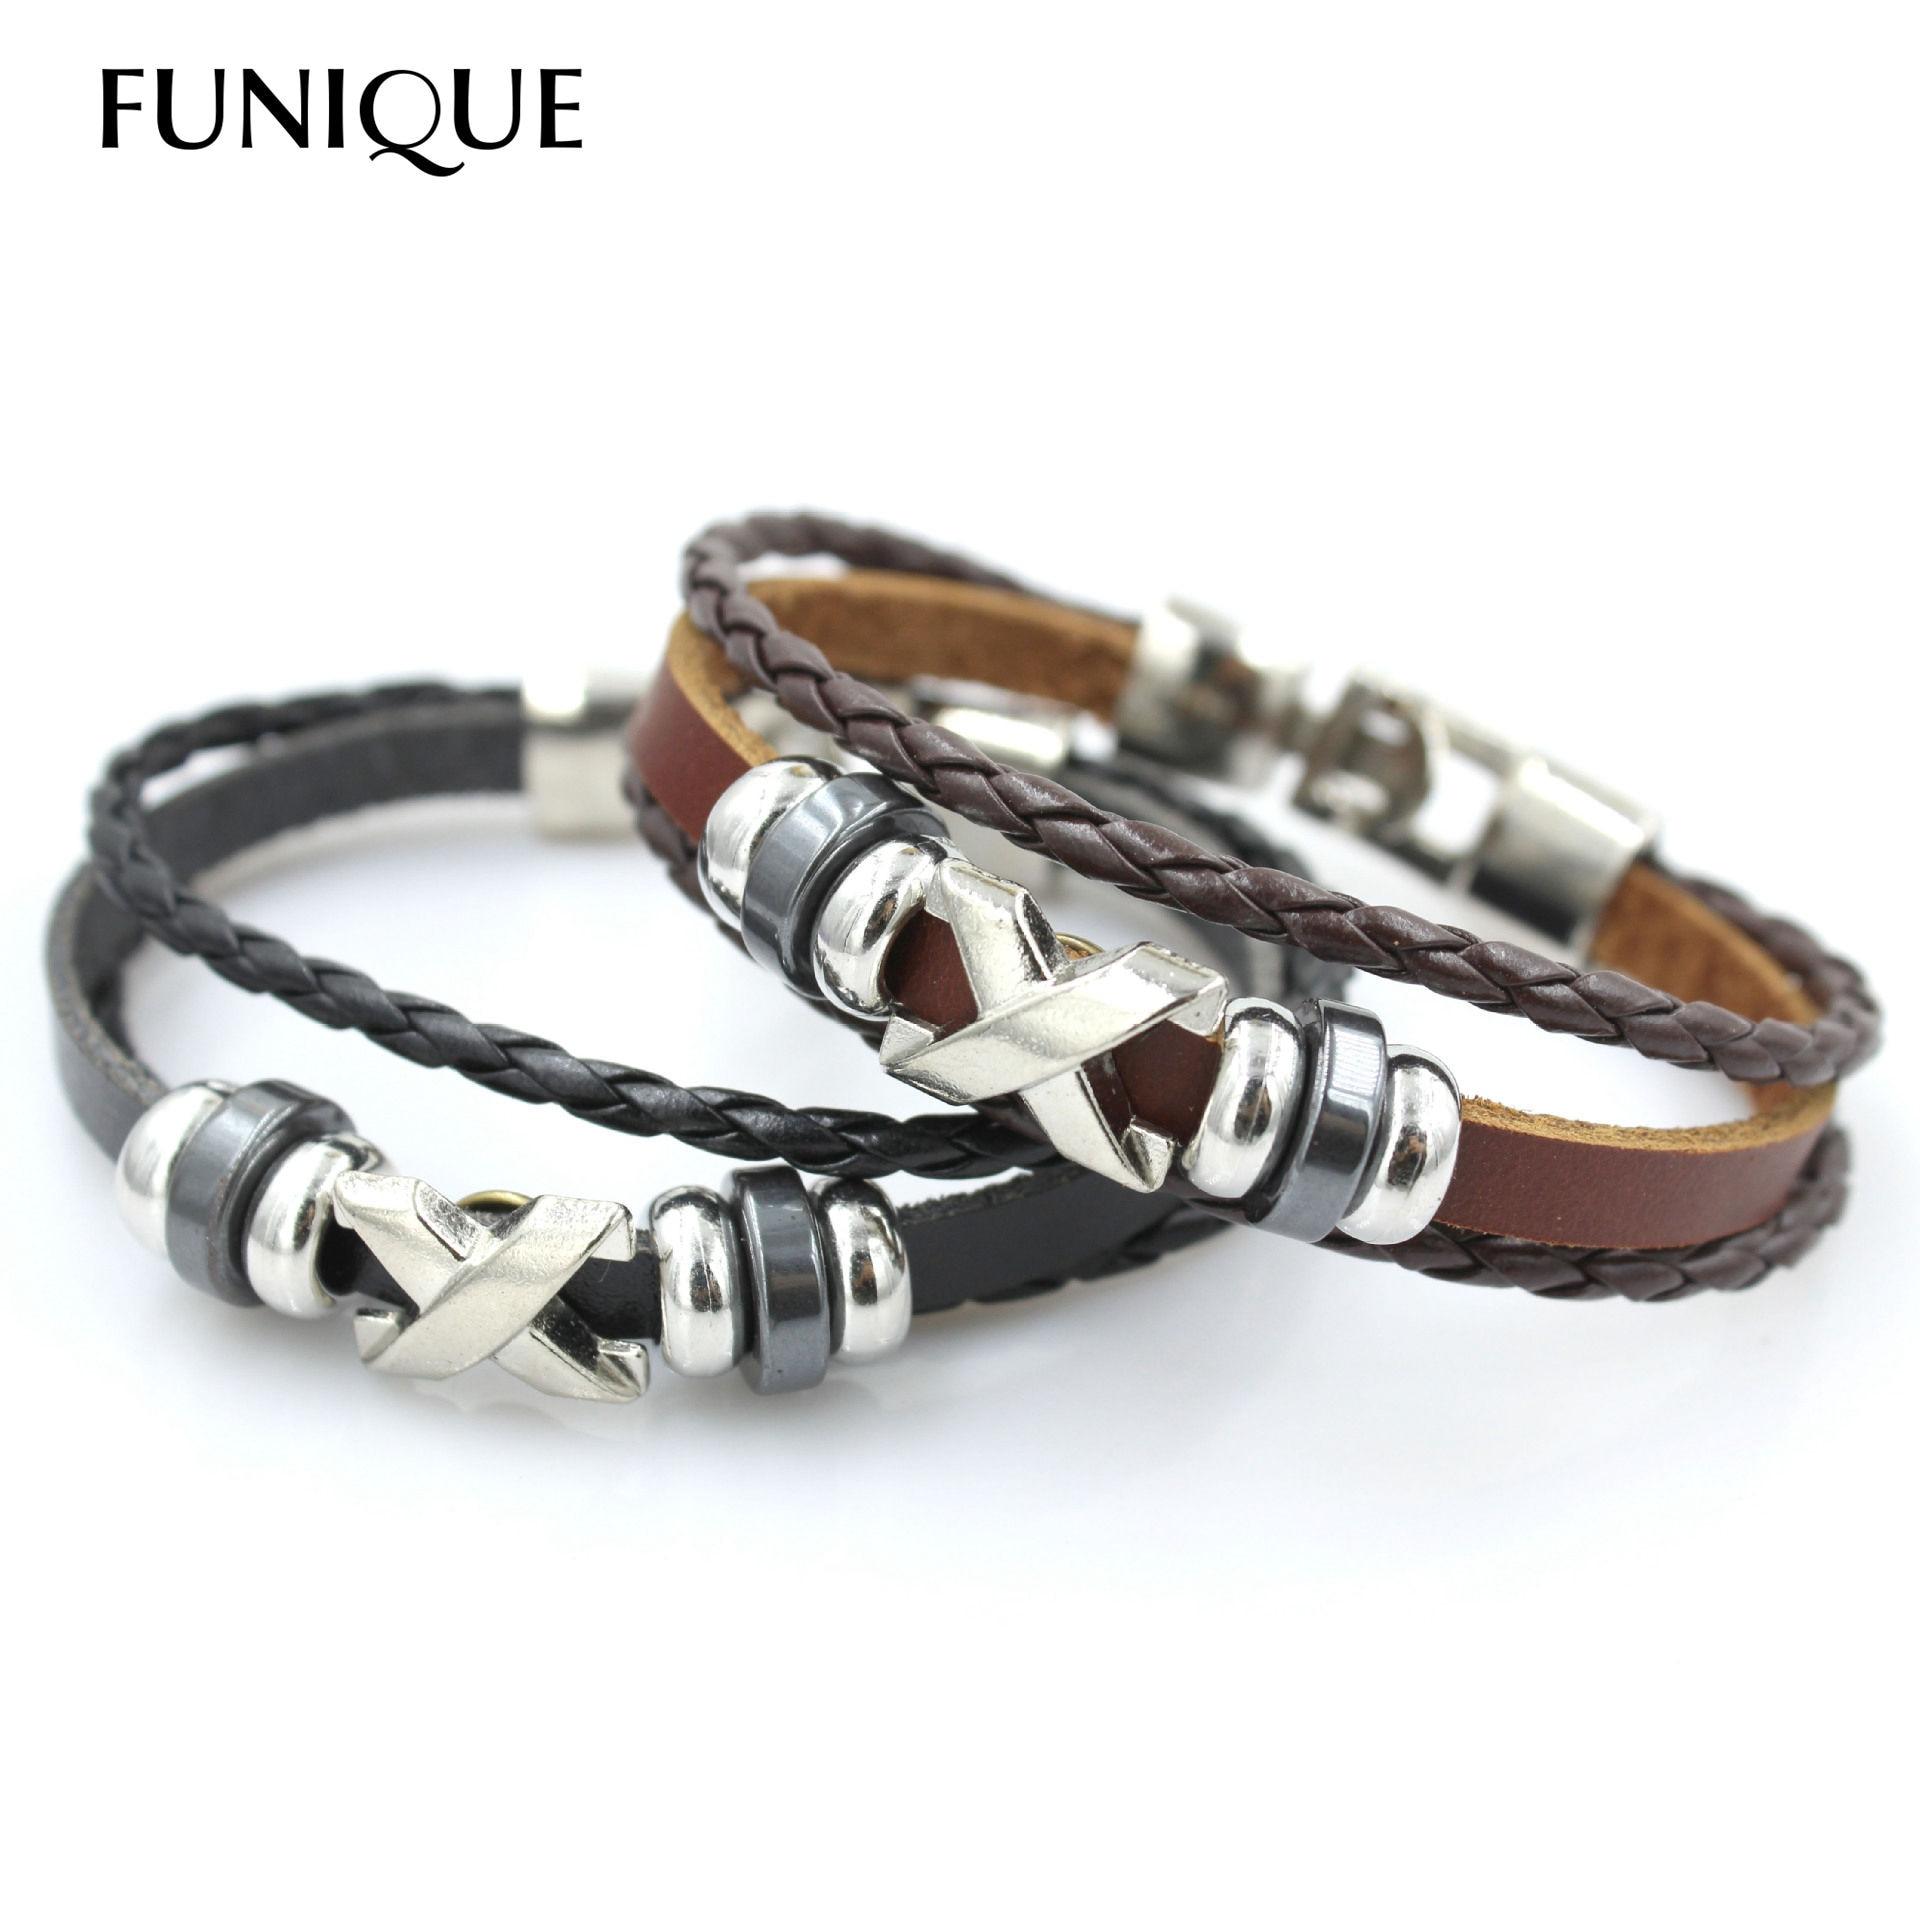 Punk Rock Multilayer Stainless Steel Beads Bracelet Men Braided Leather Bracelet For Women & Men Friendship Wrap Bracelets